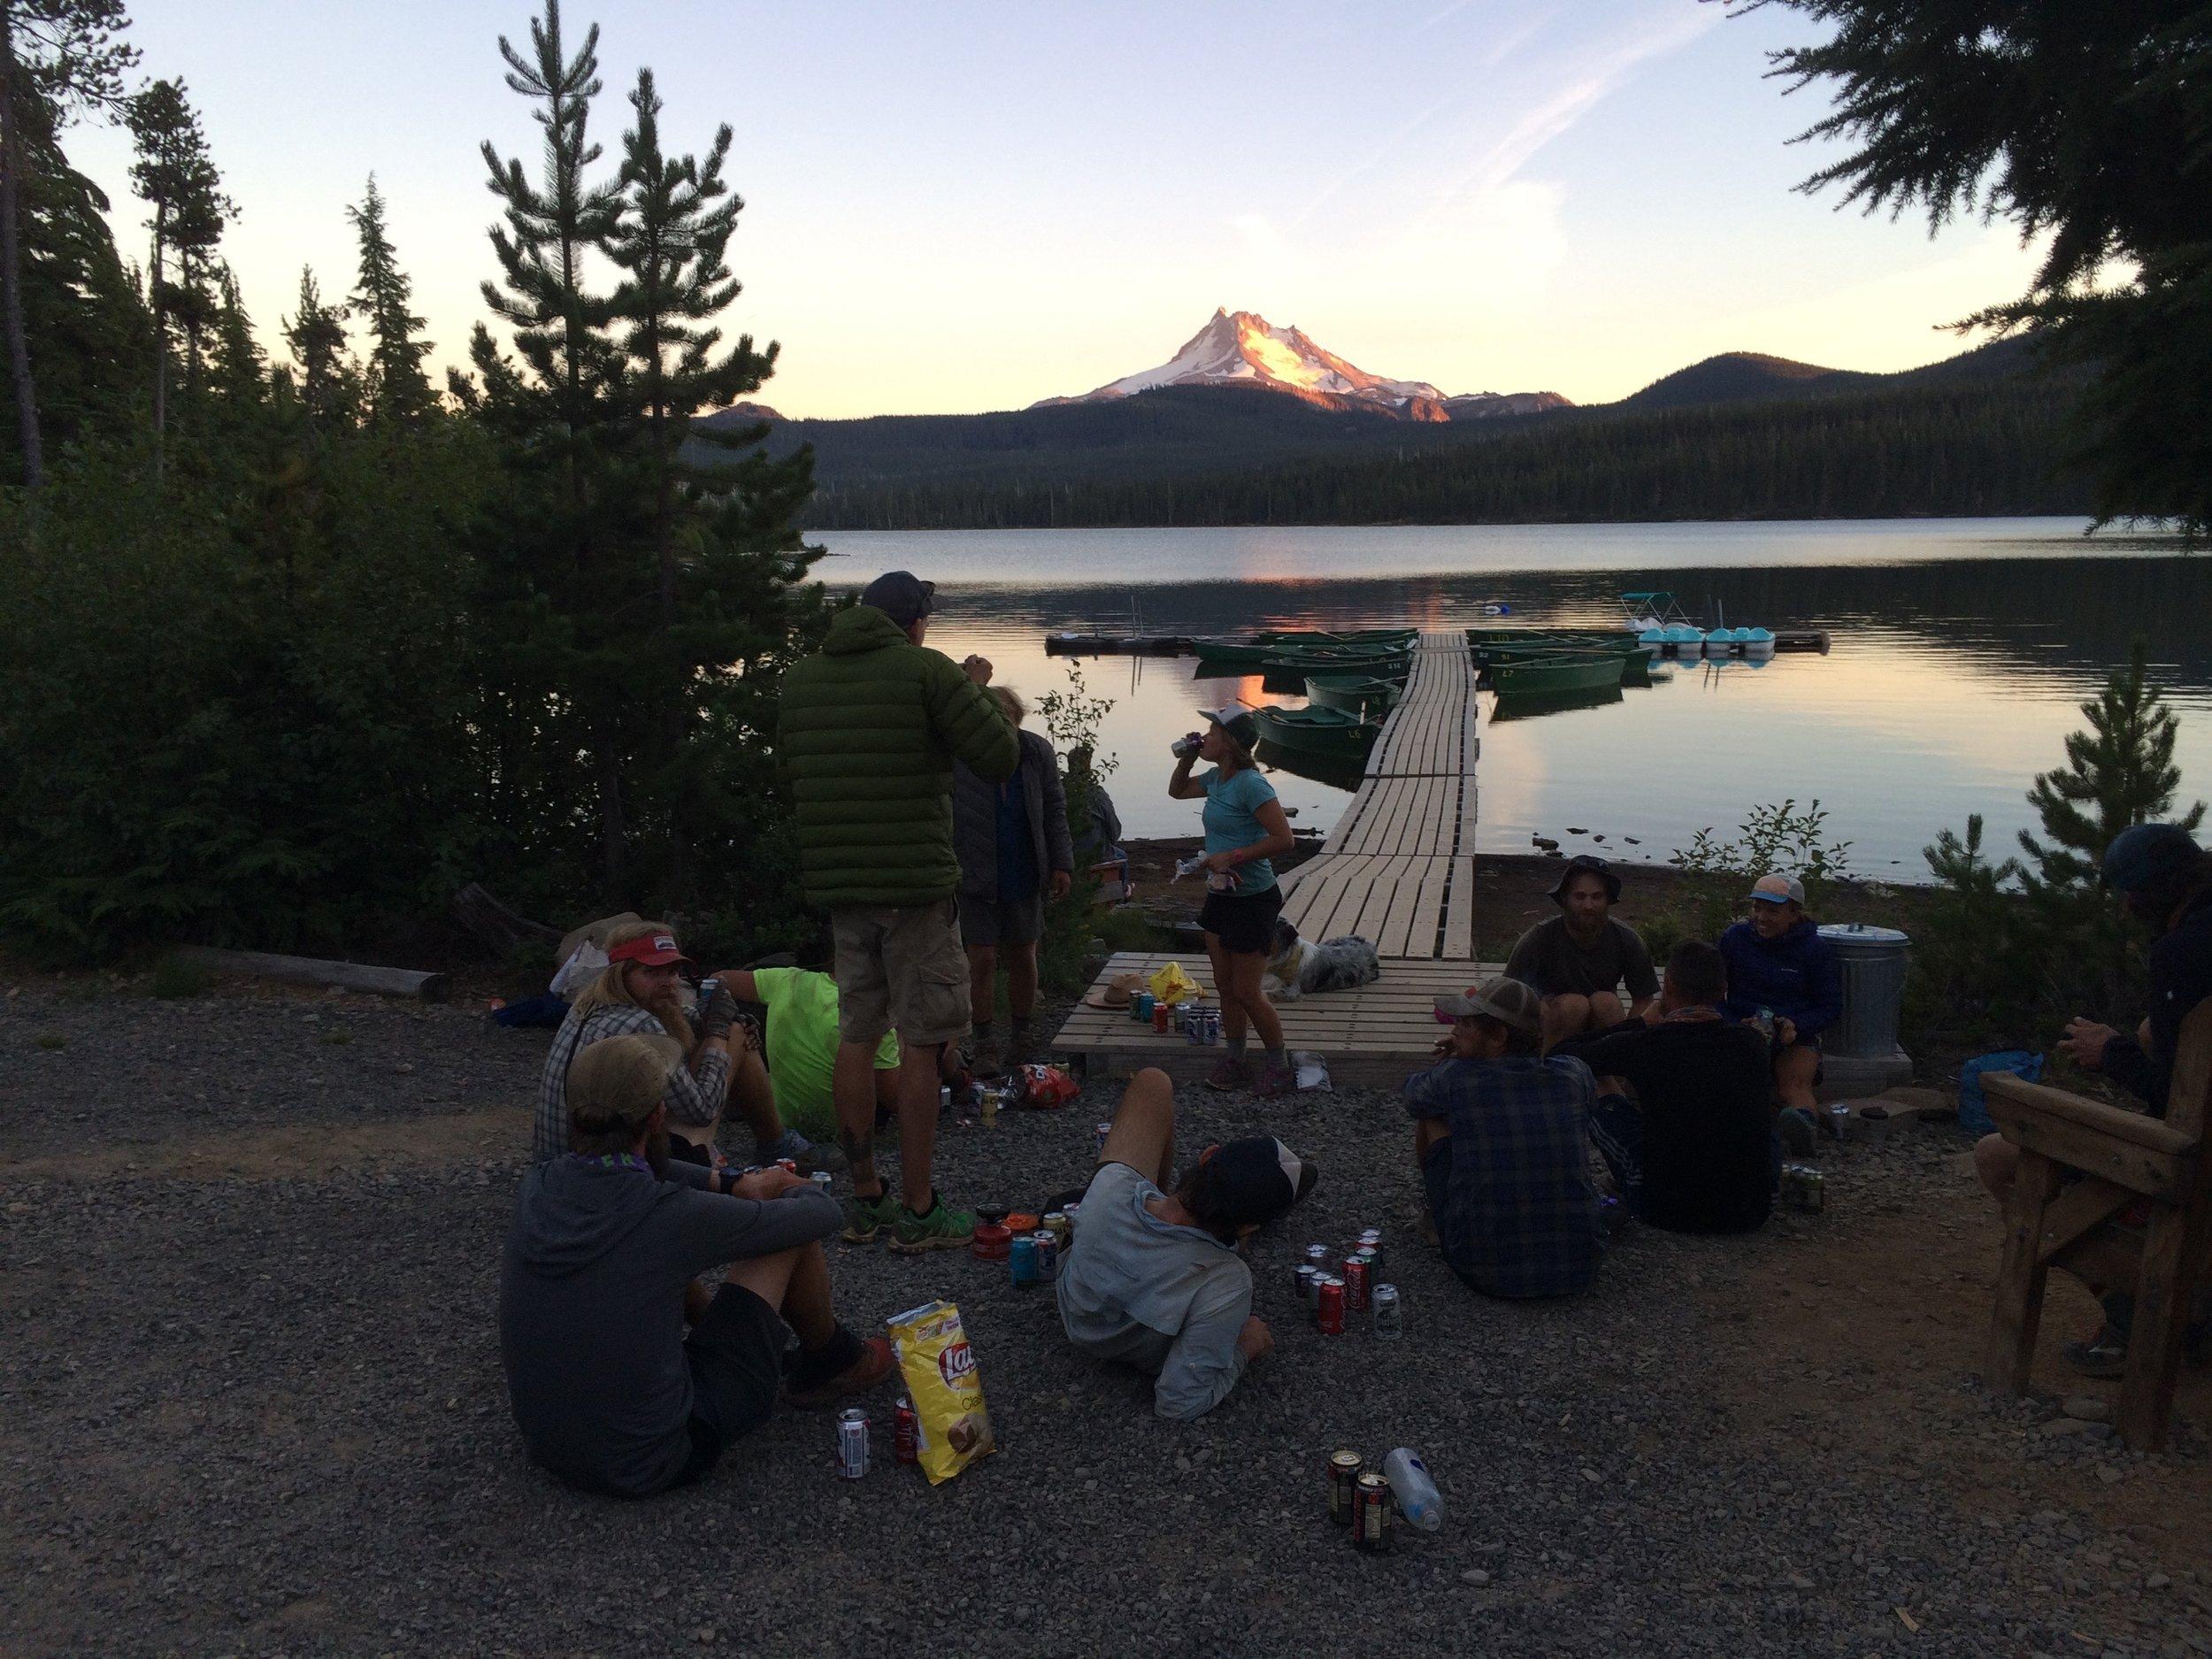 Olallie Lake- Willamette National Forest, OR